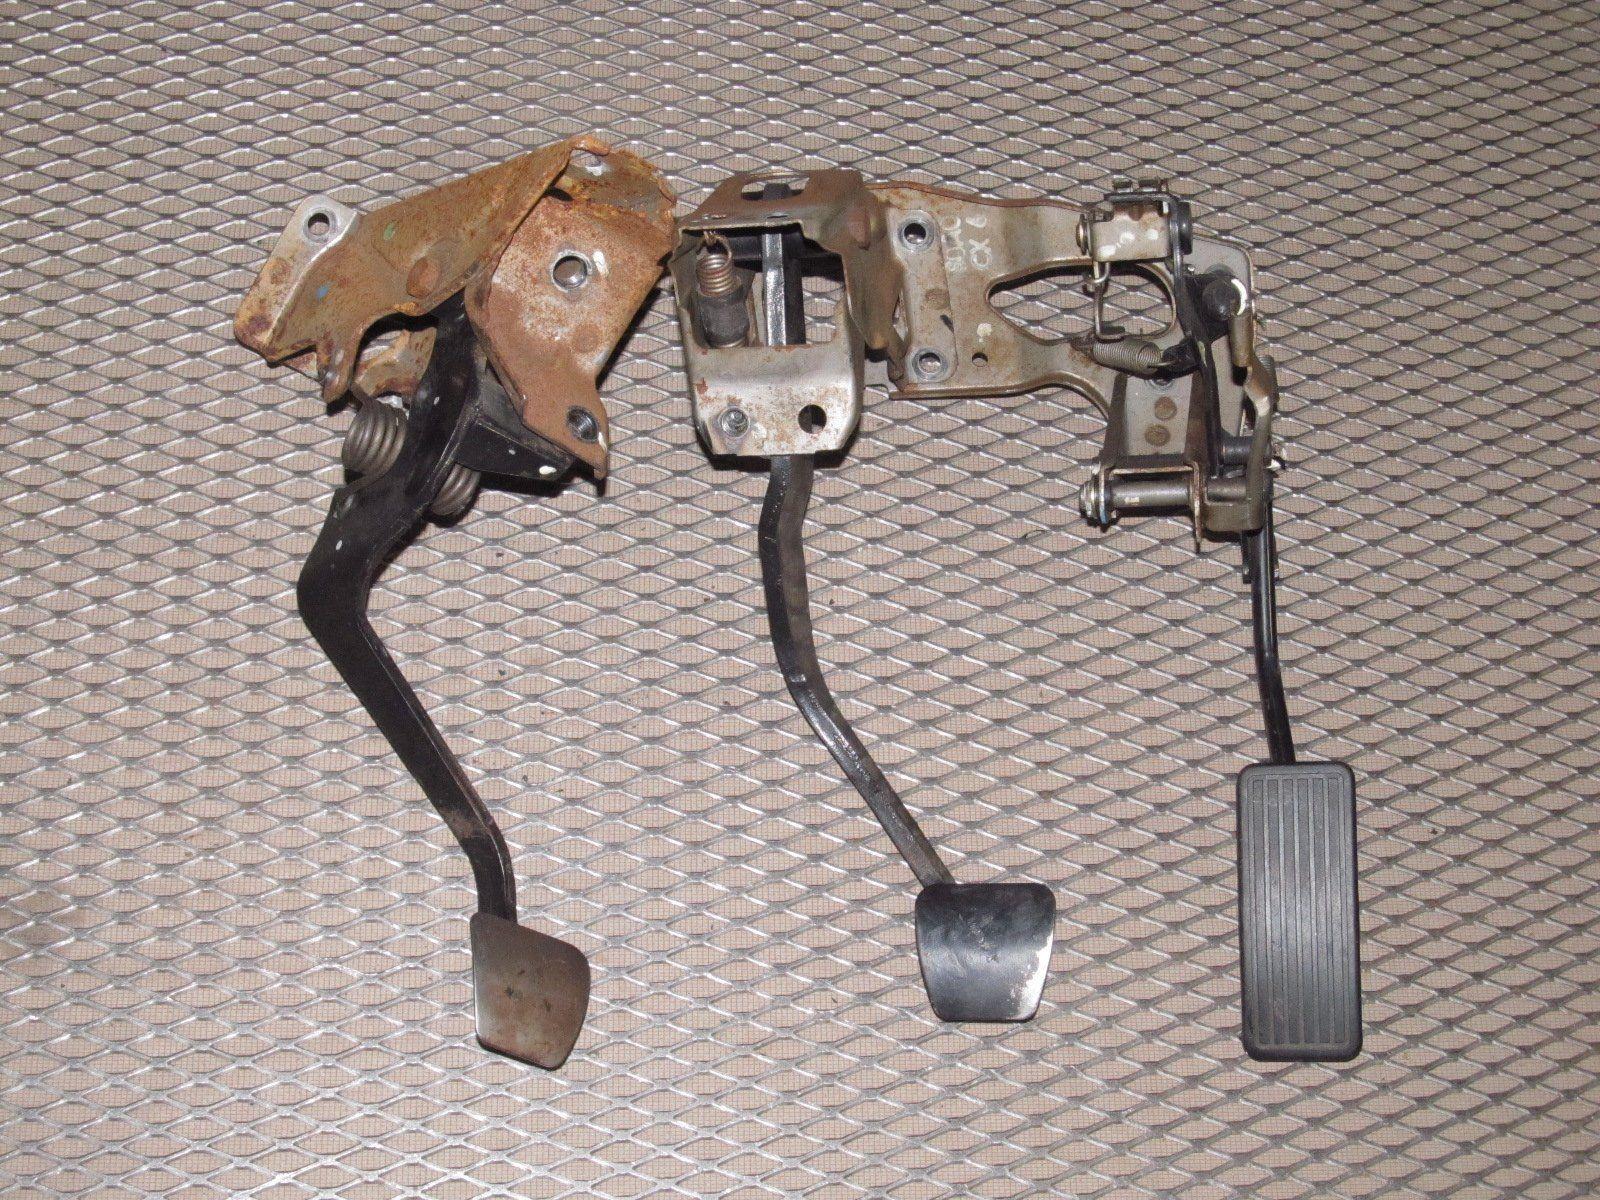 92 93 94 95 Prelude Si Vtec Manual Oem Engine Wiring Harness ... H Engine Wiring Harness on